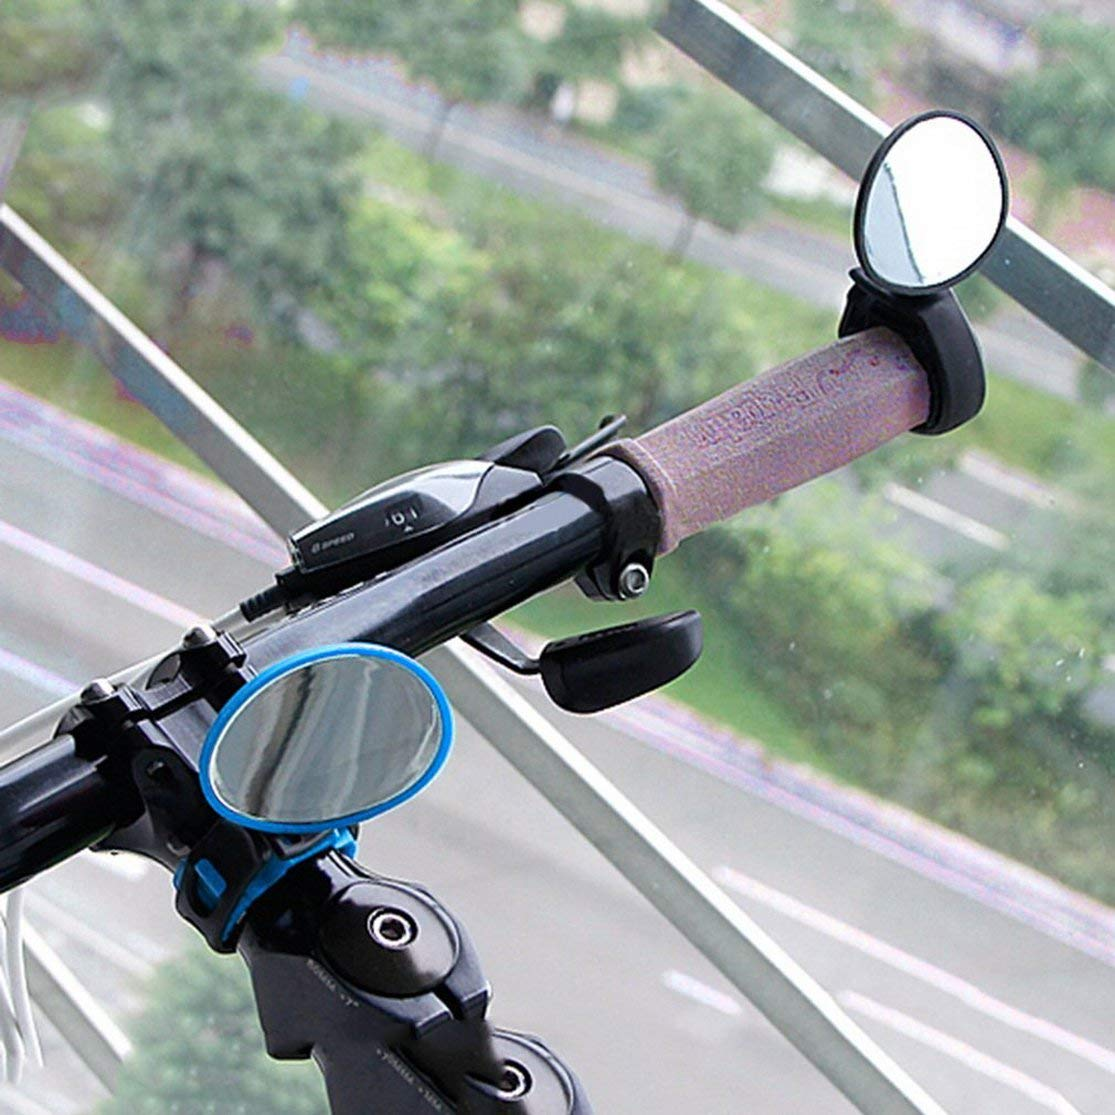 Color:Black Kaemma Bicicleta Bicicleta Ciclismo Universal Ajustable Vista Posterior Espejo Manillar Retrovisor Accesorios para Bicicletas Seguridad Flexible Retrovisor